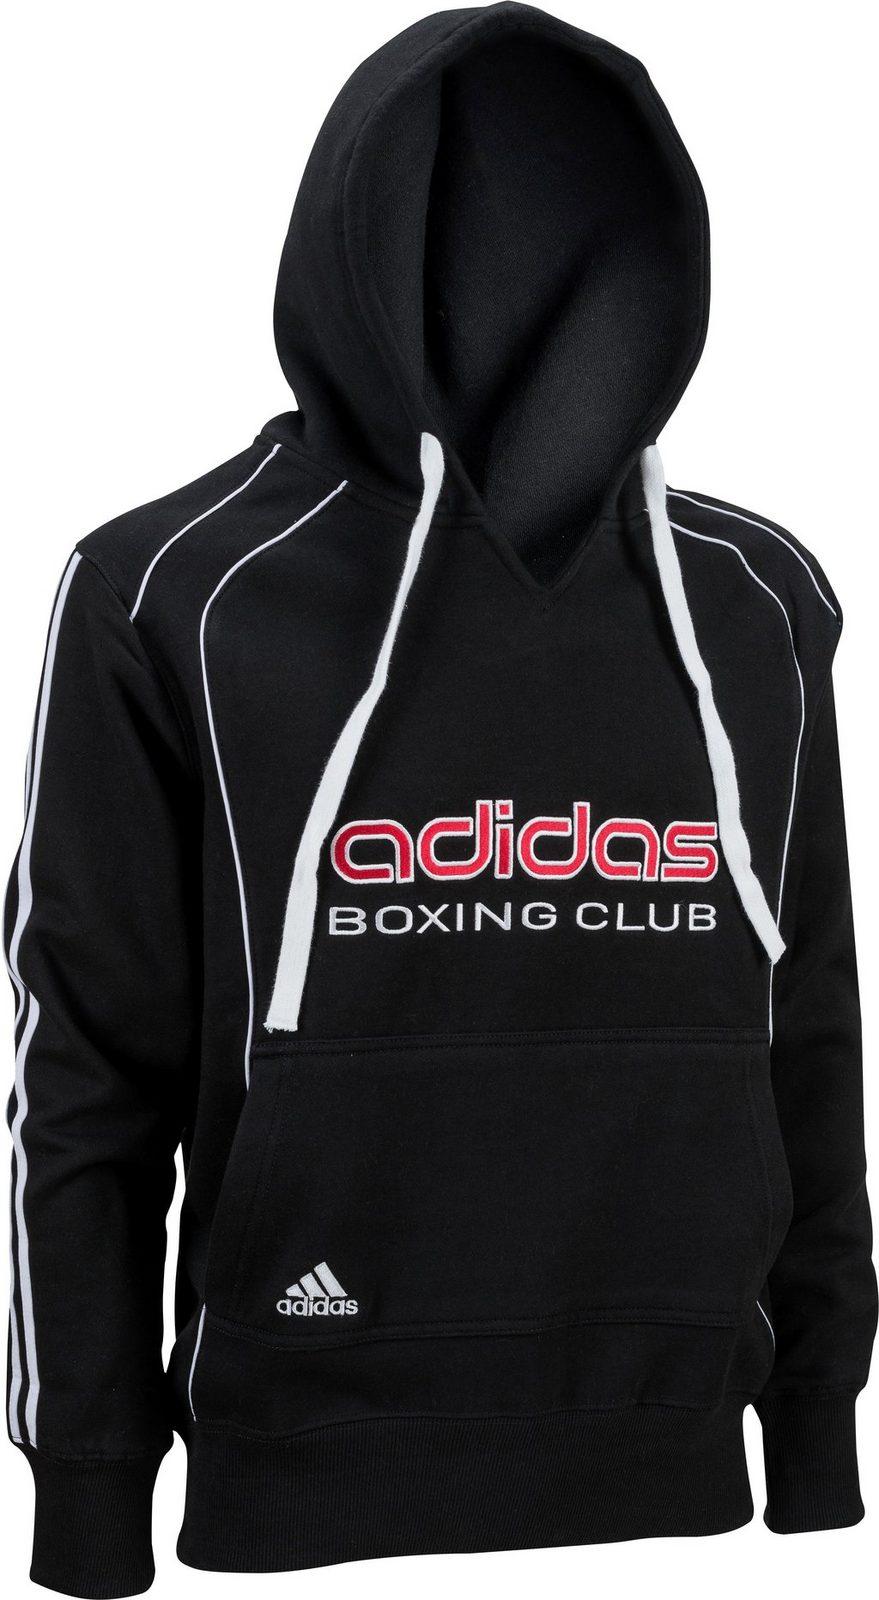 adidas Performance Kapuzensweatshirt, »Boxing Club« jetztbilligerkaufen